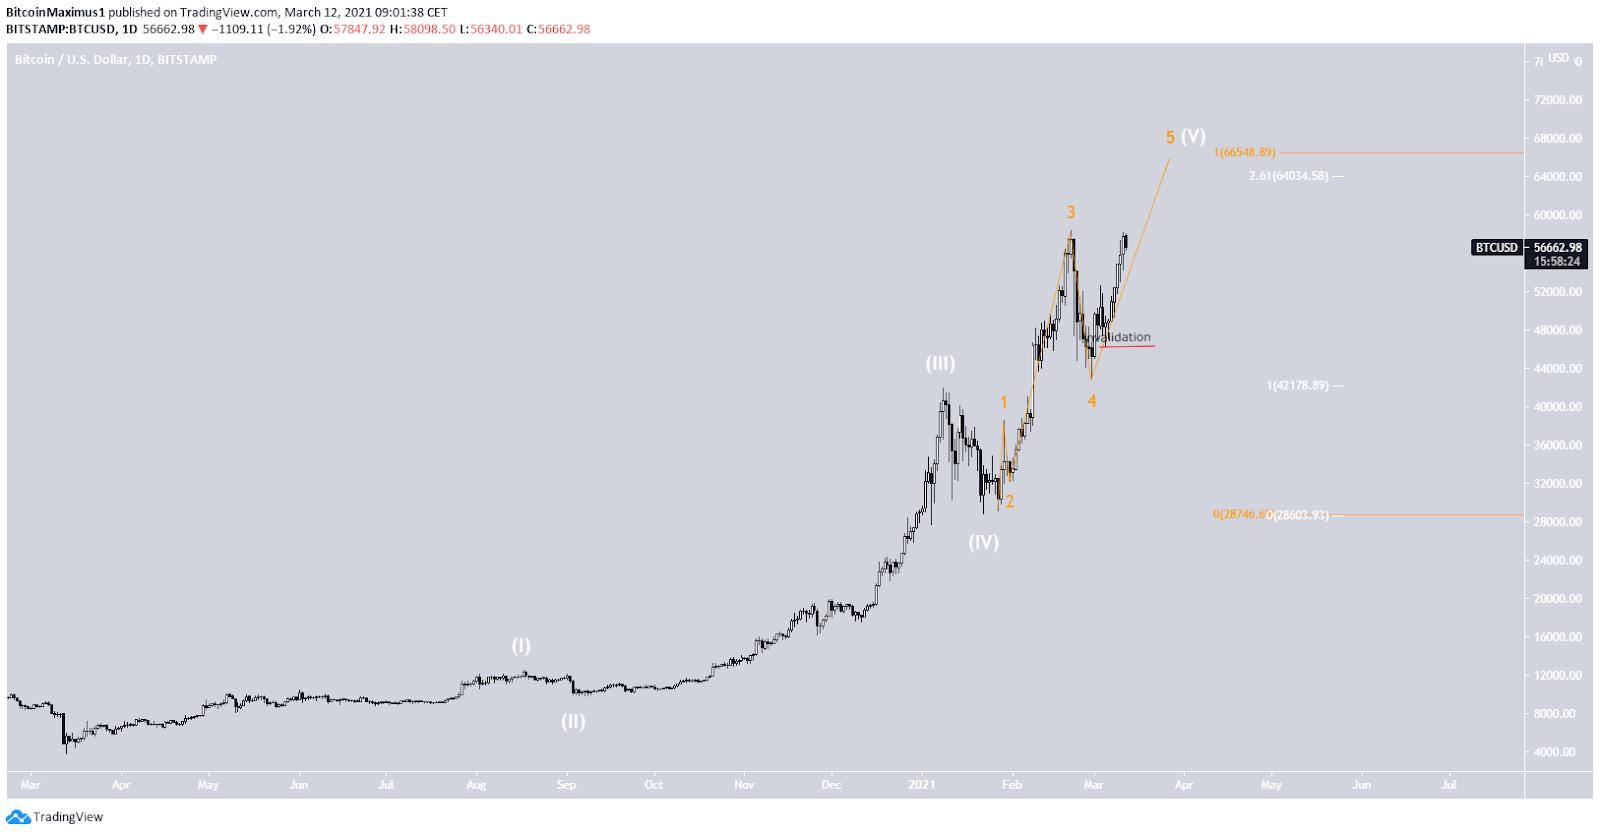 Bitcoin Preis Welleanalyse